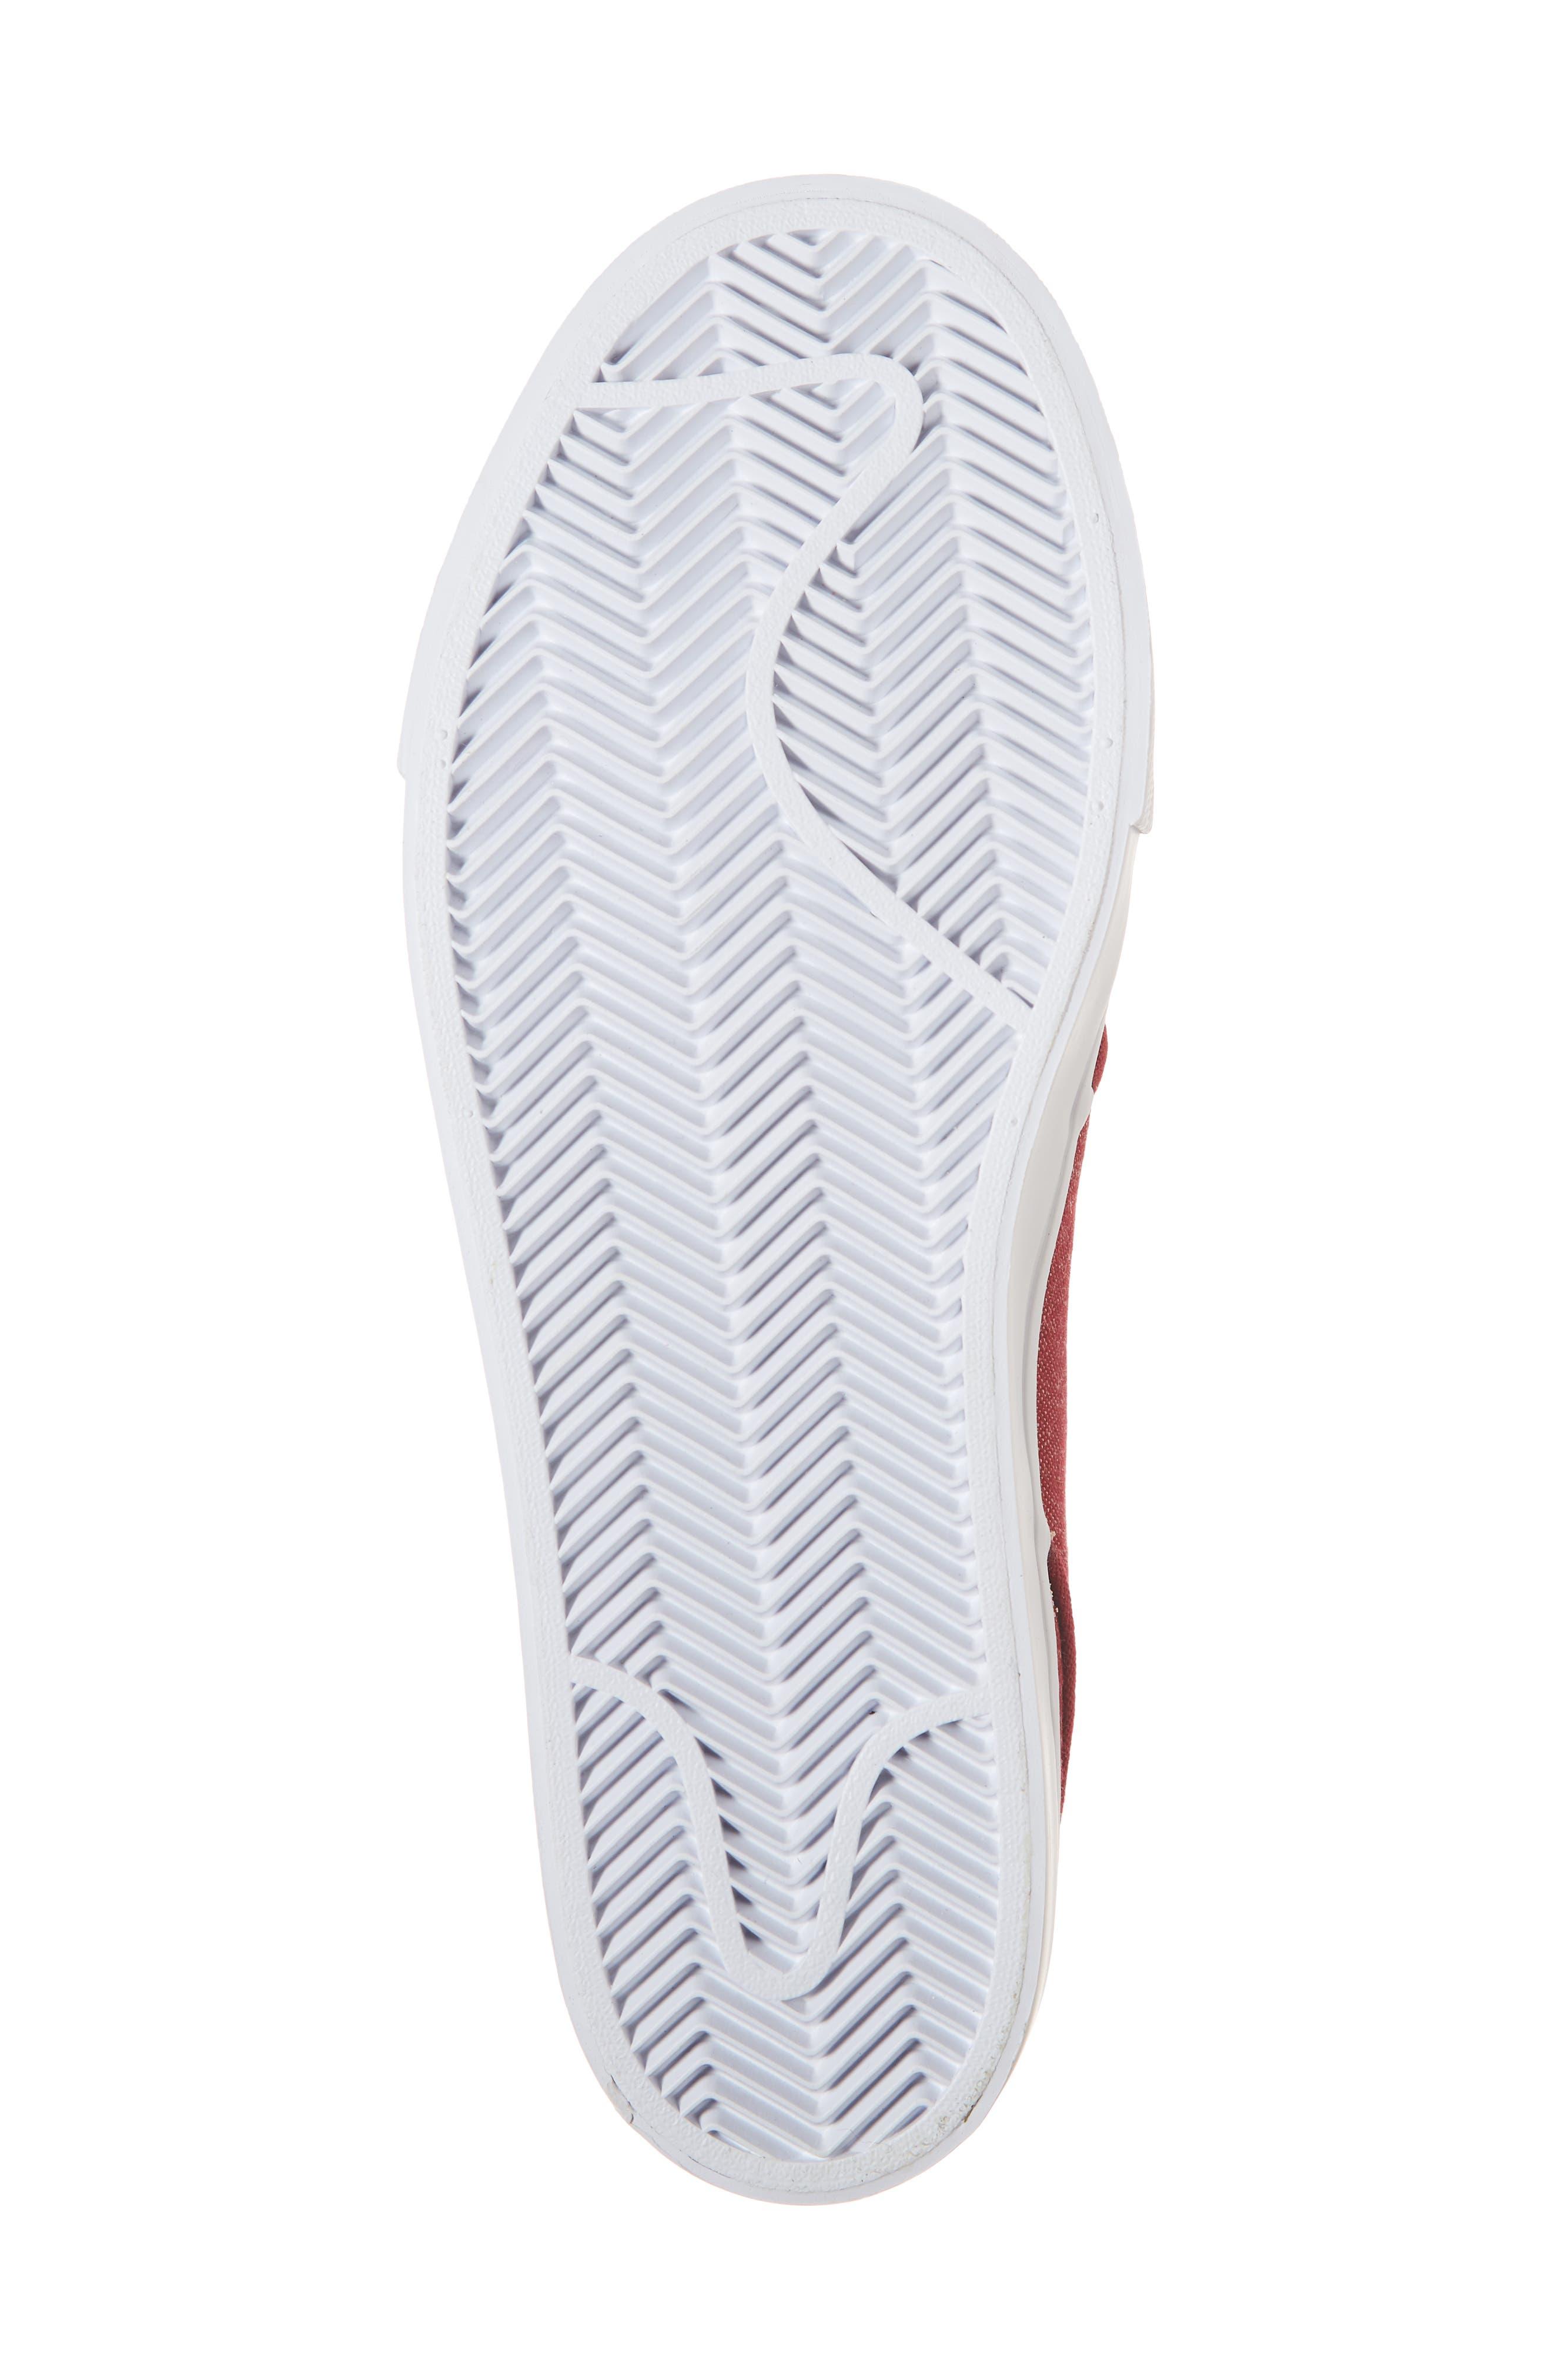 Zoom - Stefan Janoski SB Canvas Skate Shoe,                             Alternate thumbnail 6, color,                             Red Crush/ White